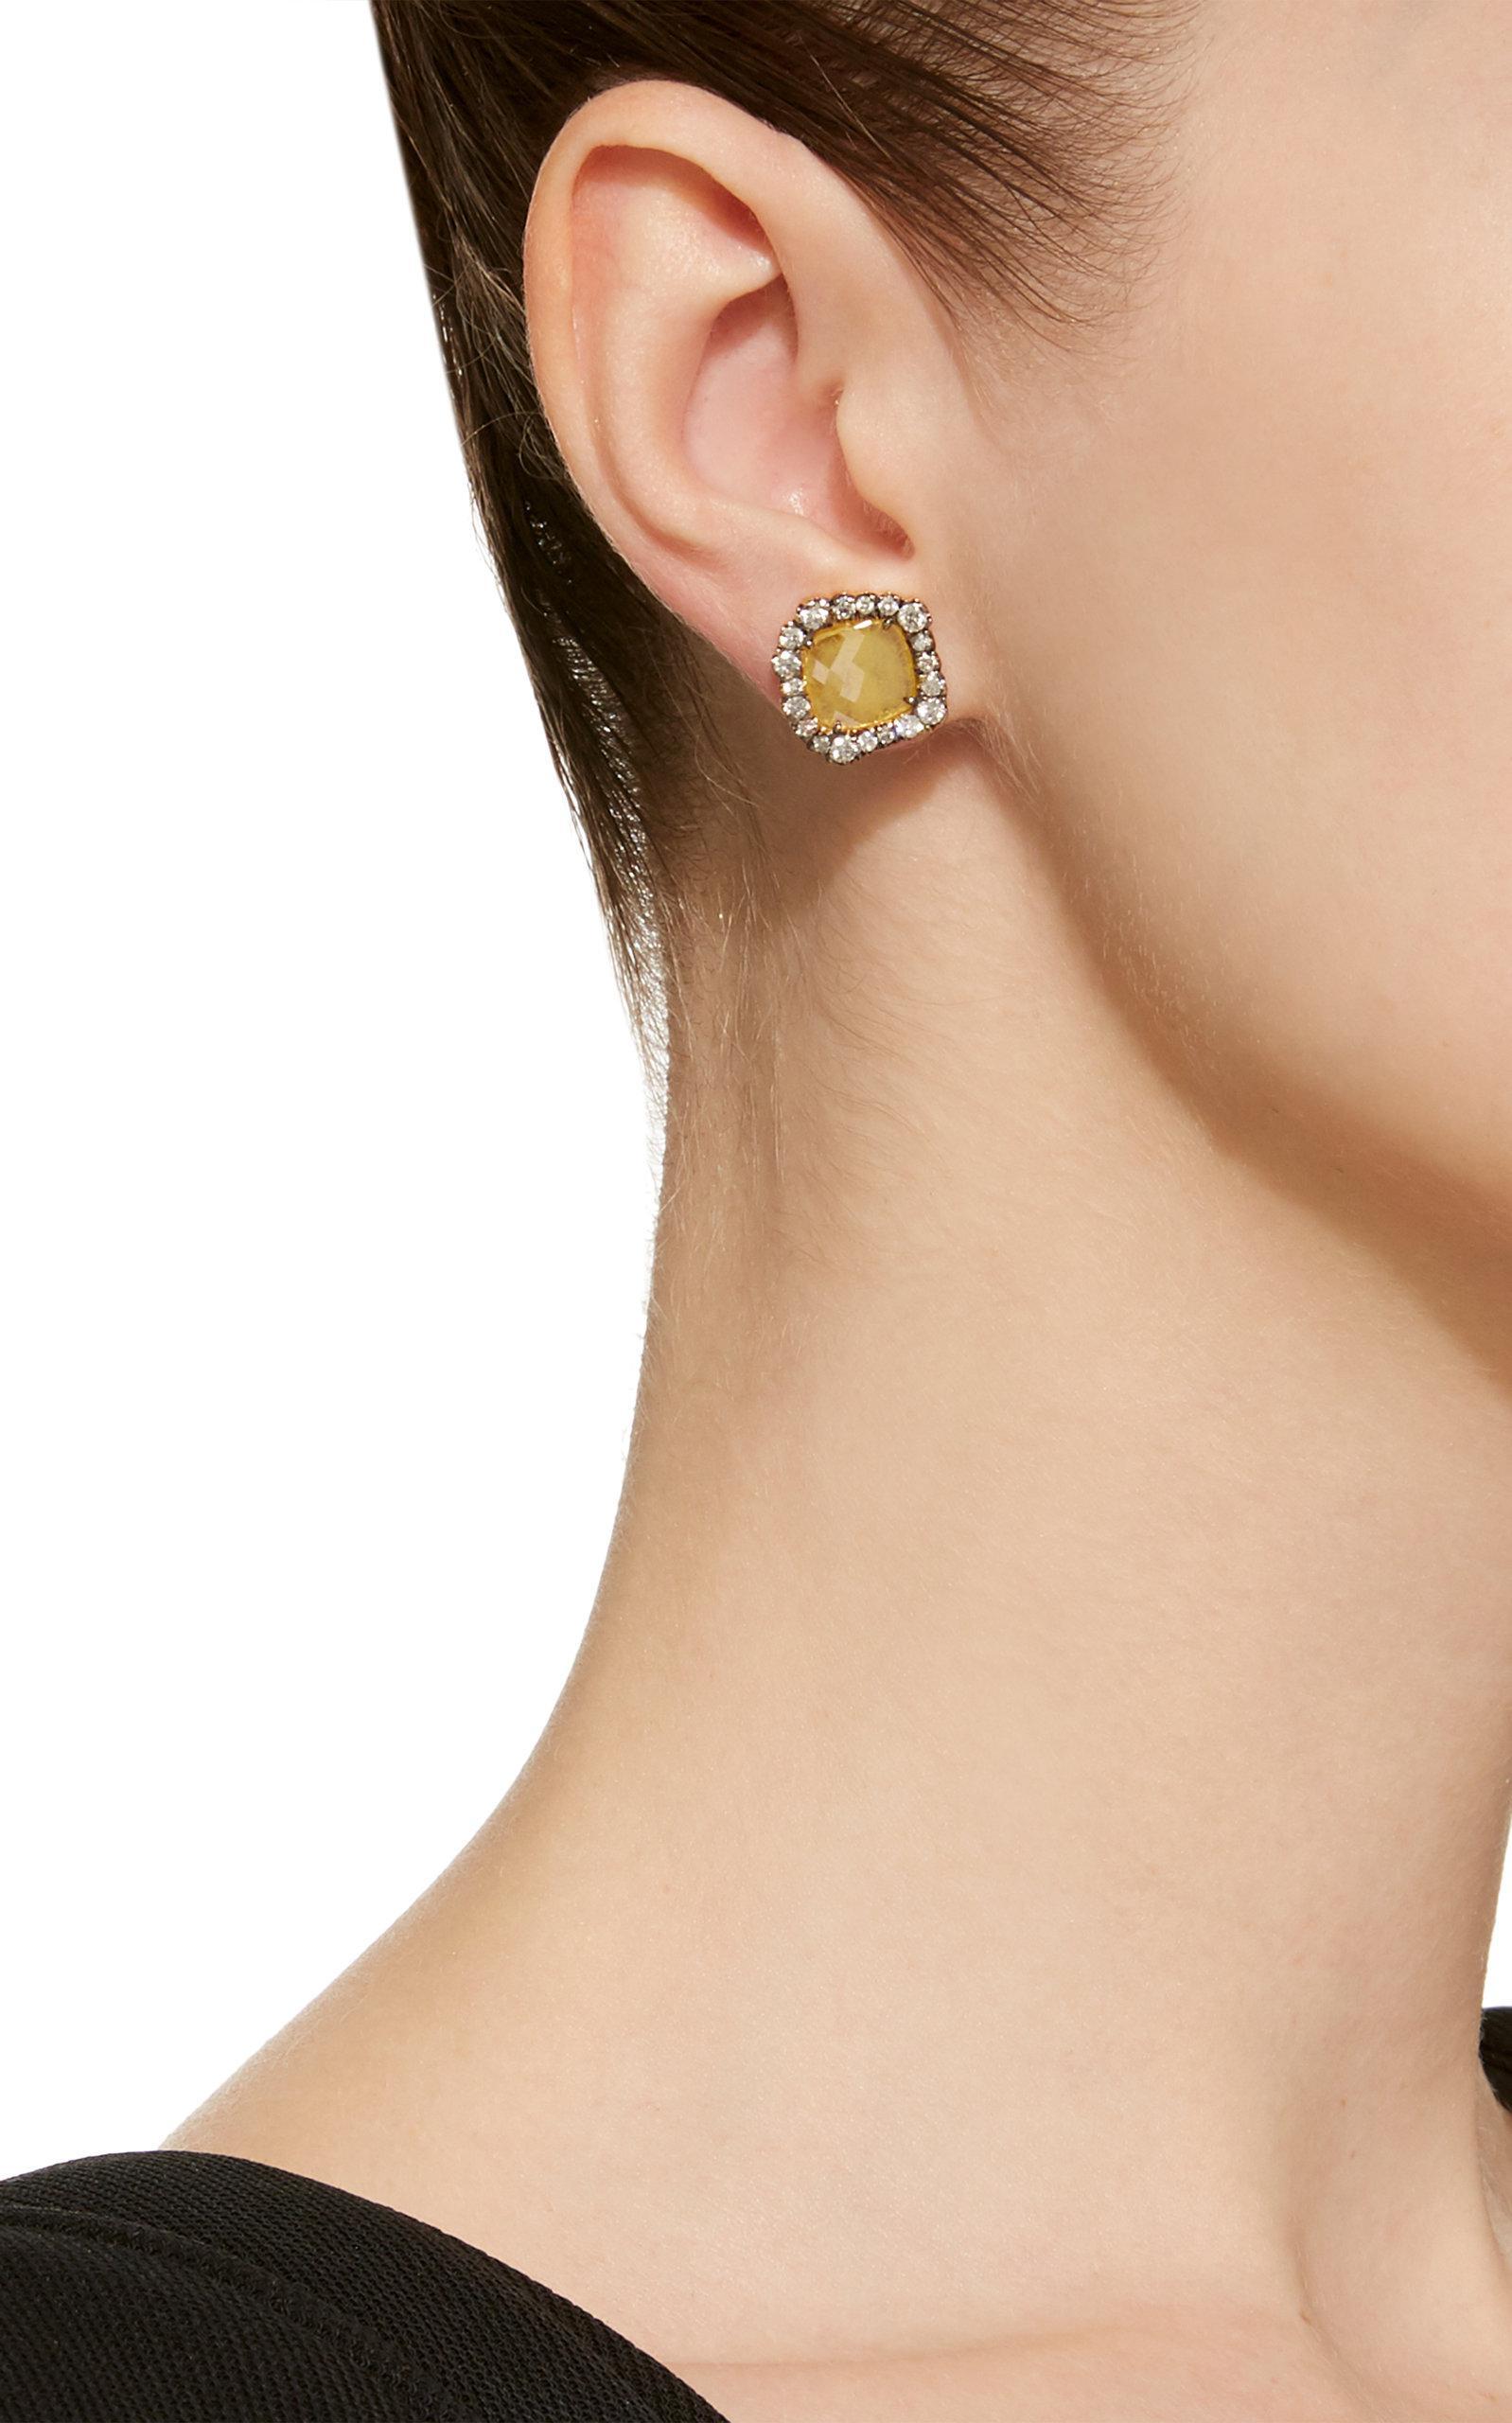 Kimberly Mcdonald One-of-a-kind Yellow Diamond Slice Studs in Metallic